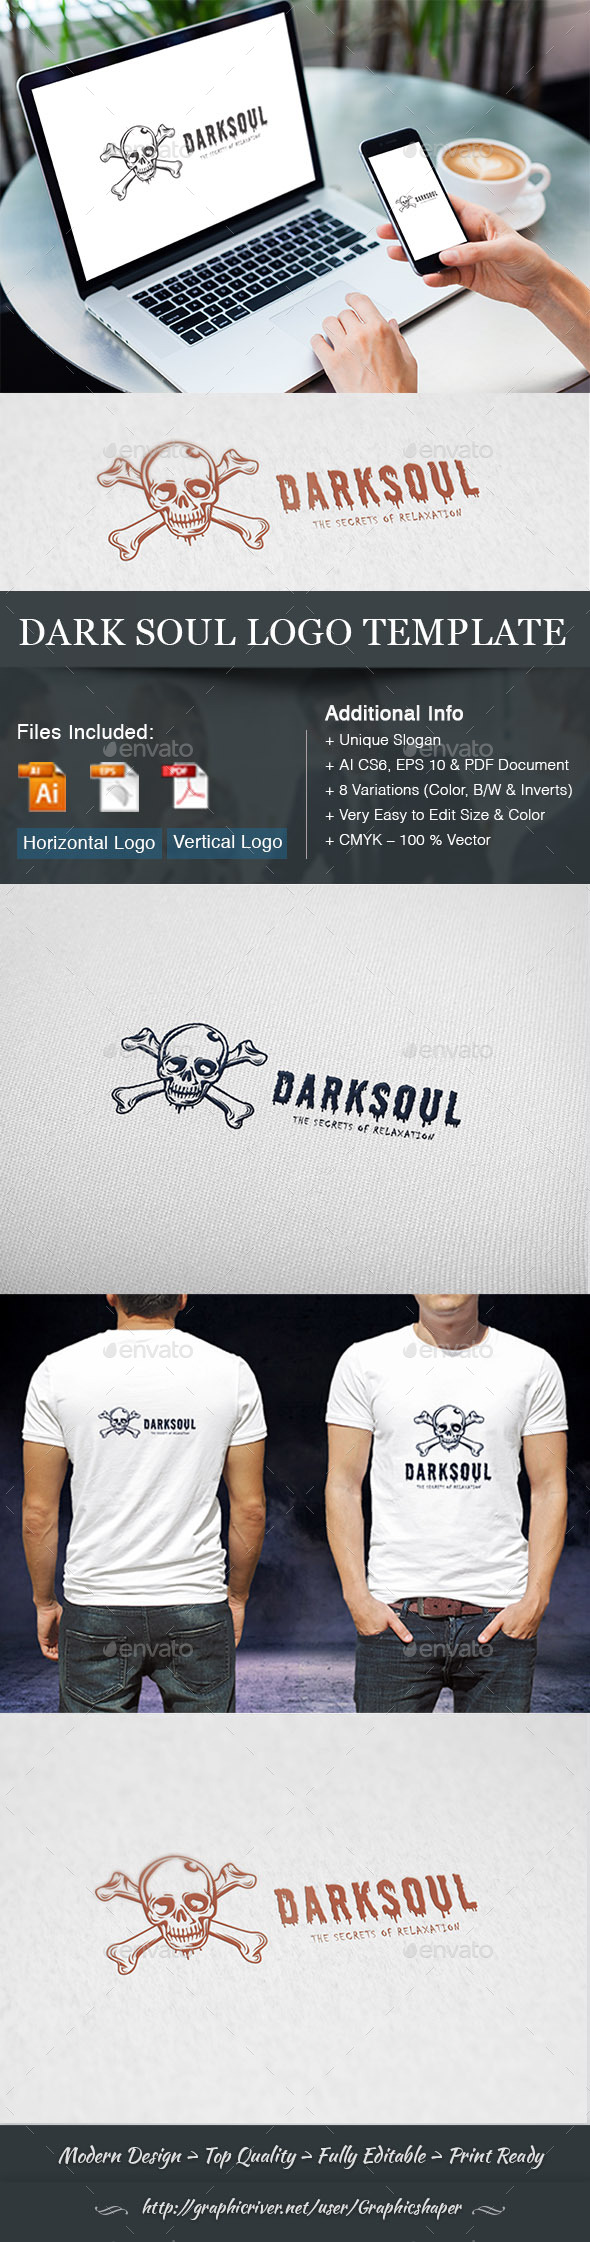 Dark Soul Logo Template